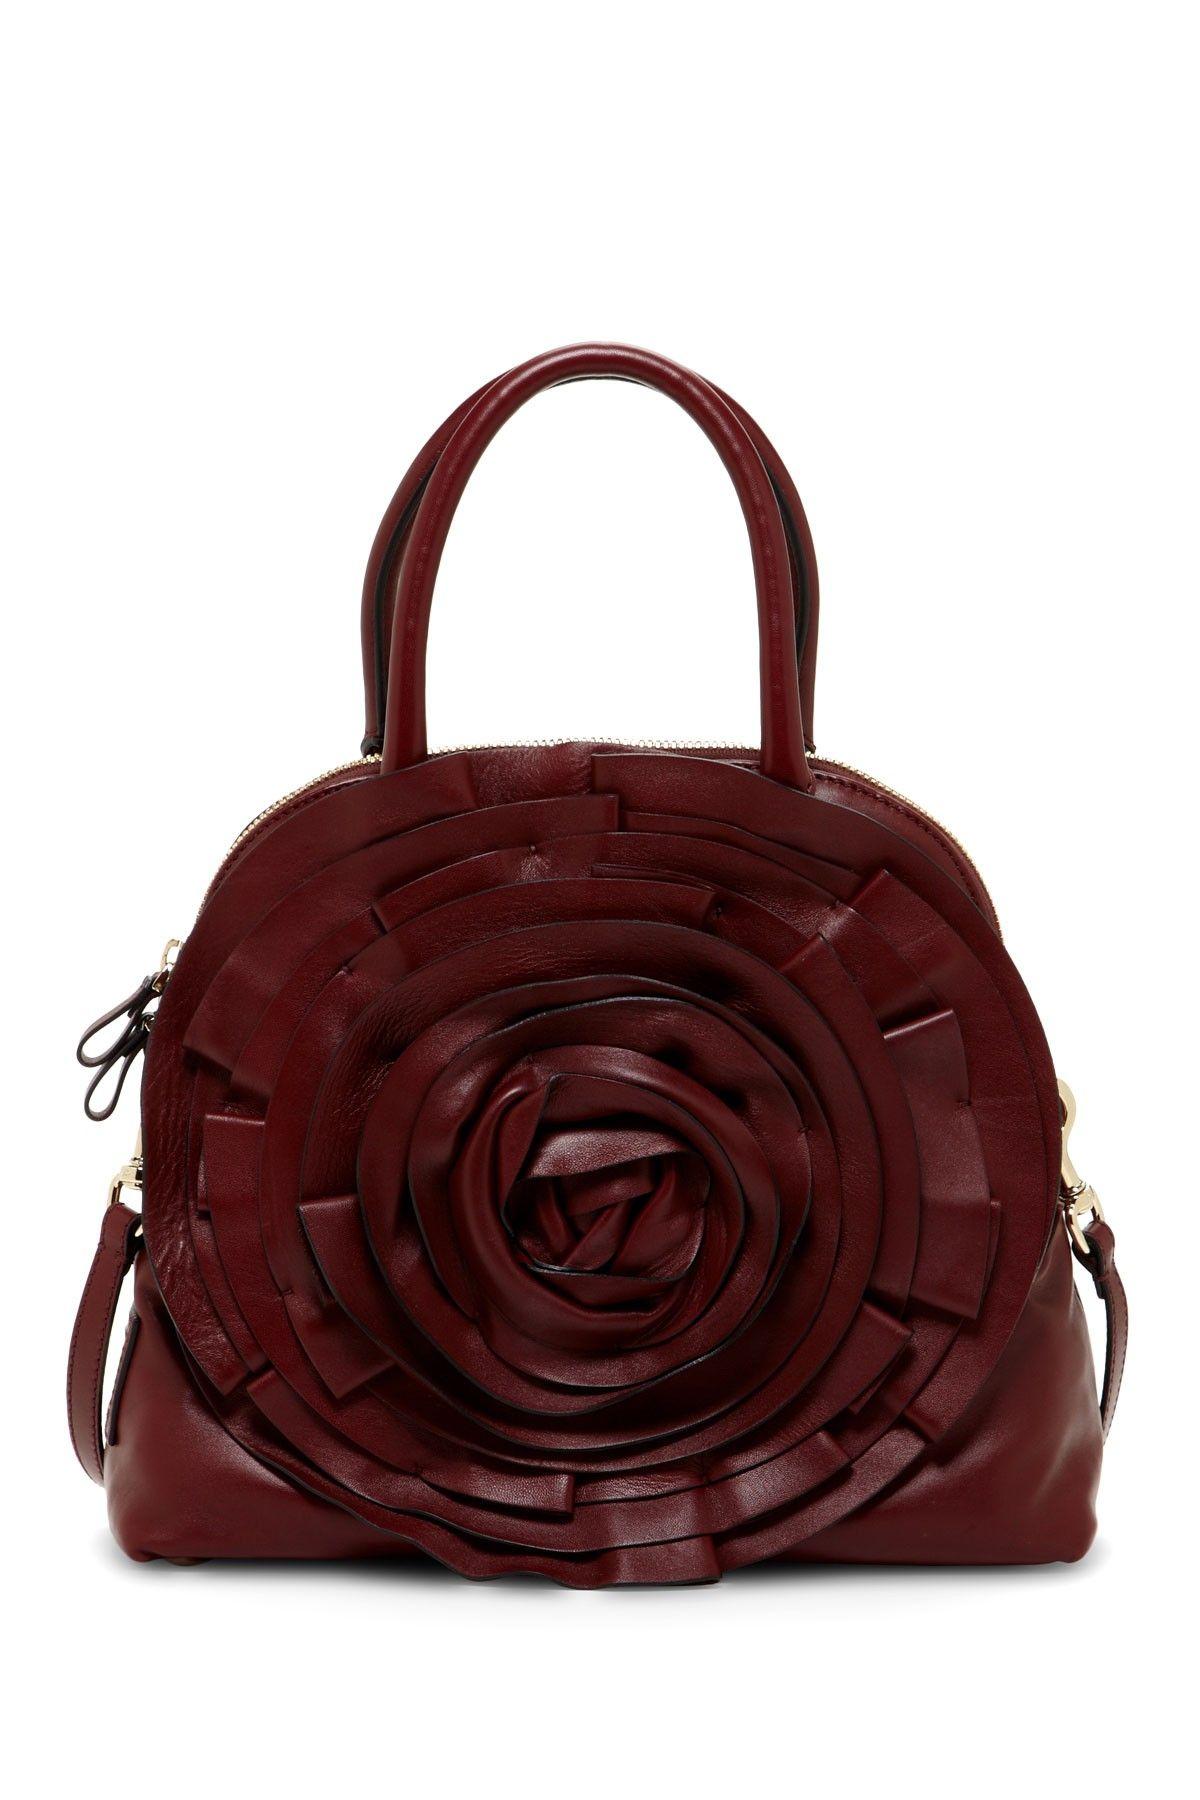 Valentino Ruffle Rosette Handbag